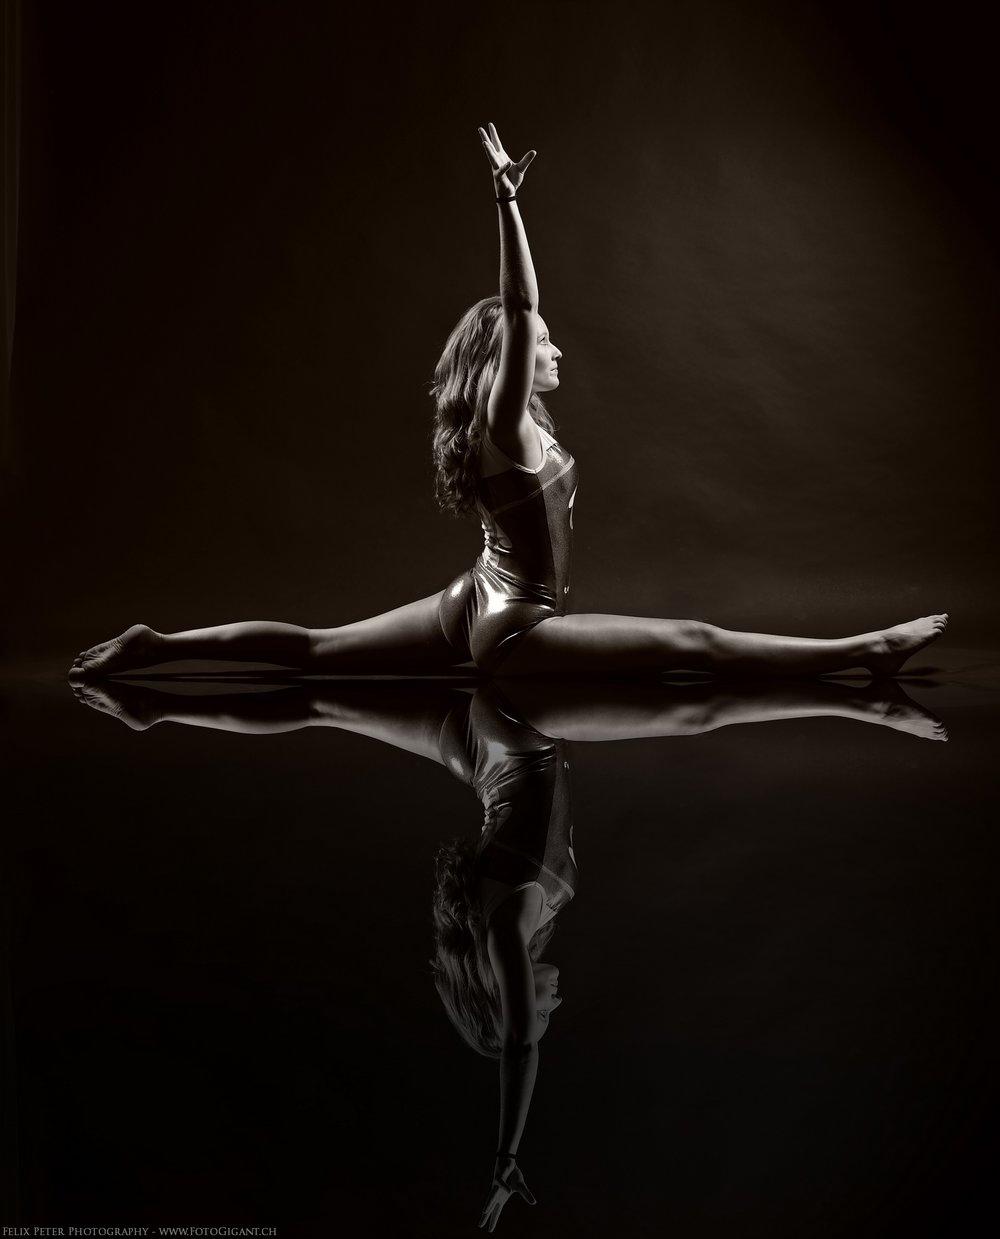 Felix-Peter-Yoga-Pilates-Dance-Fotografie_Bern_073.jpg